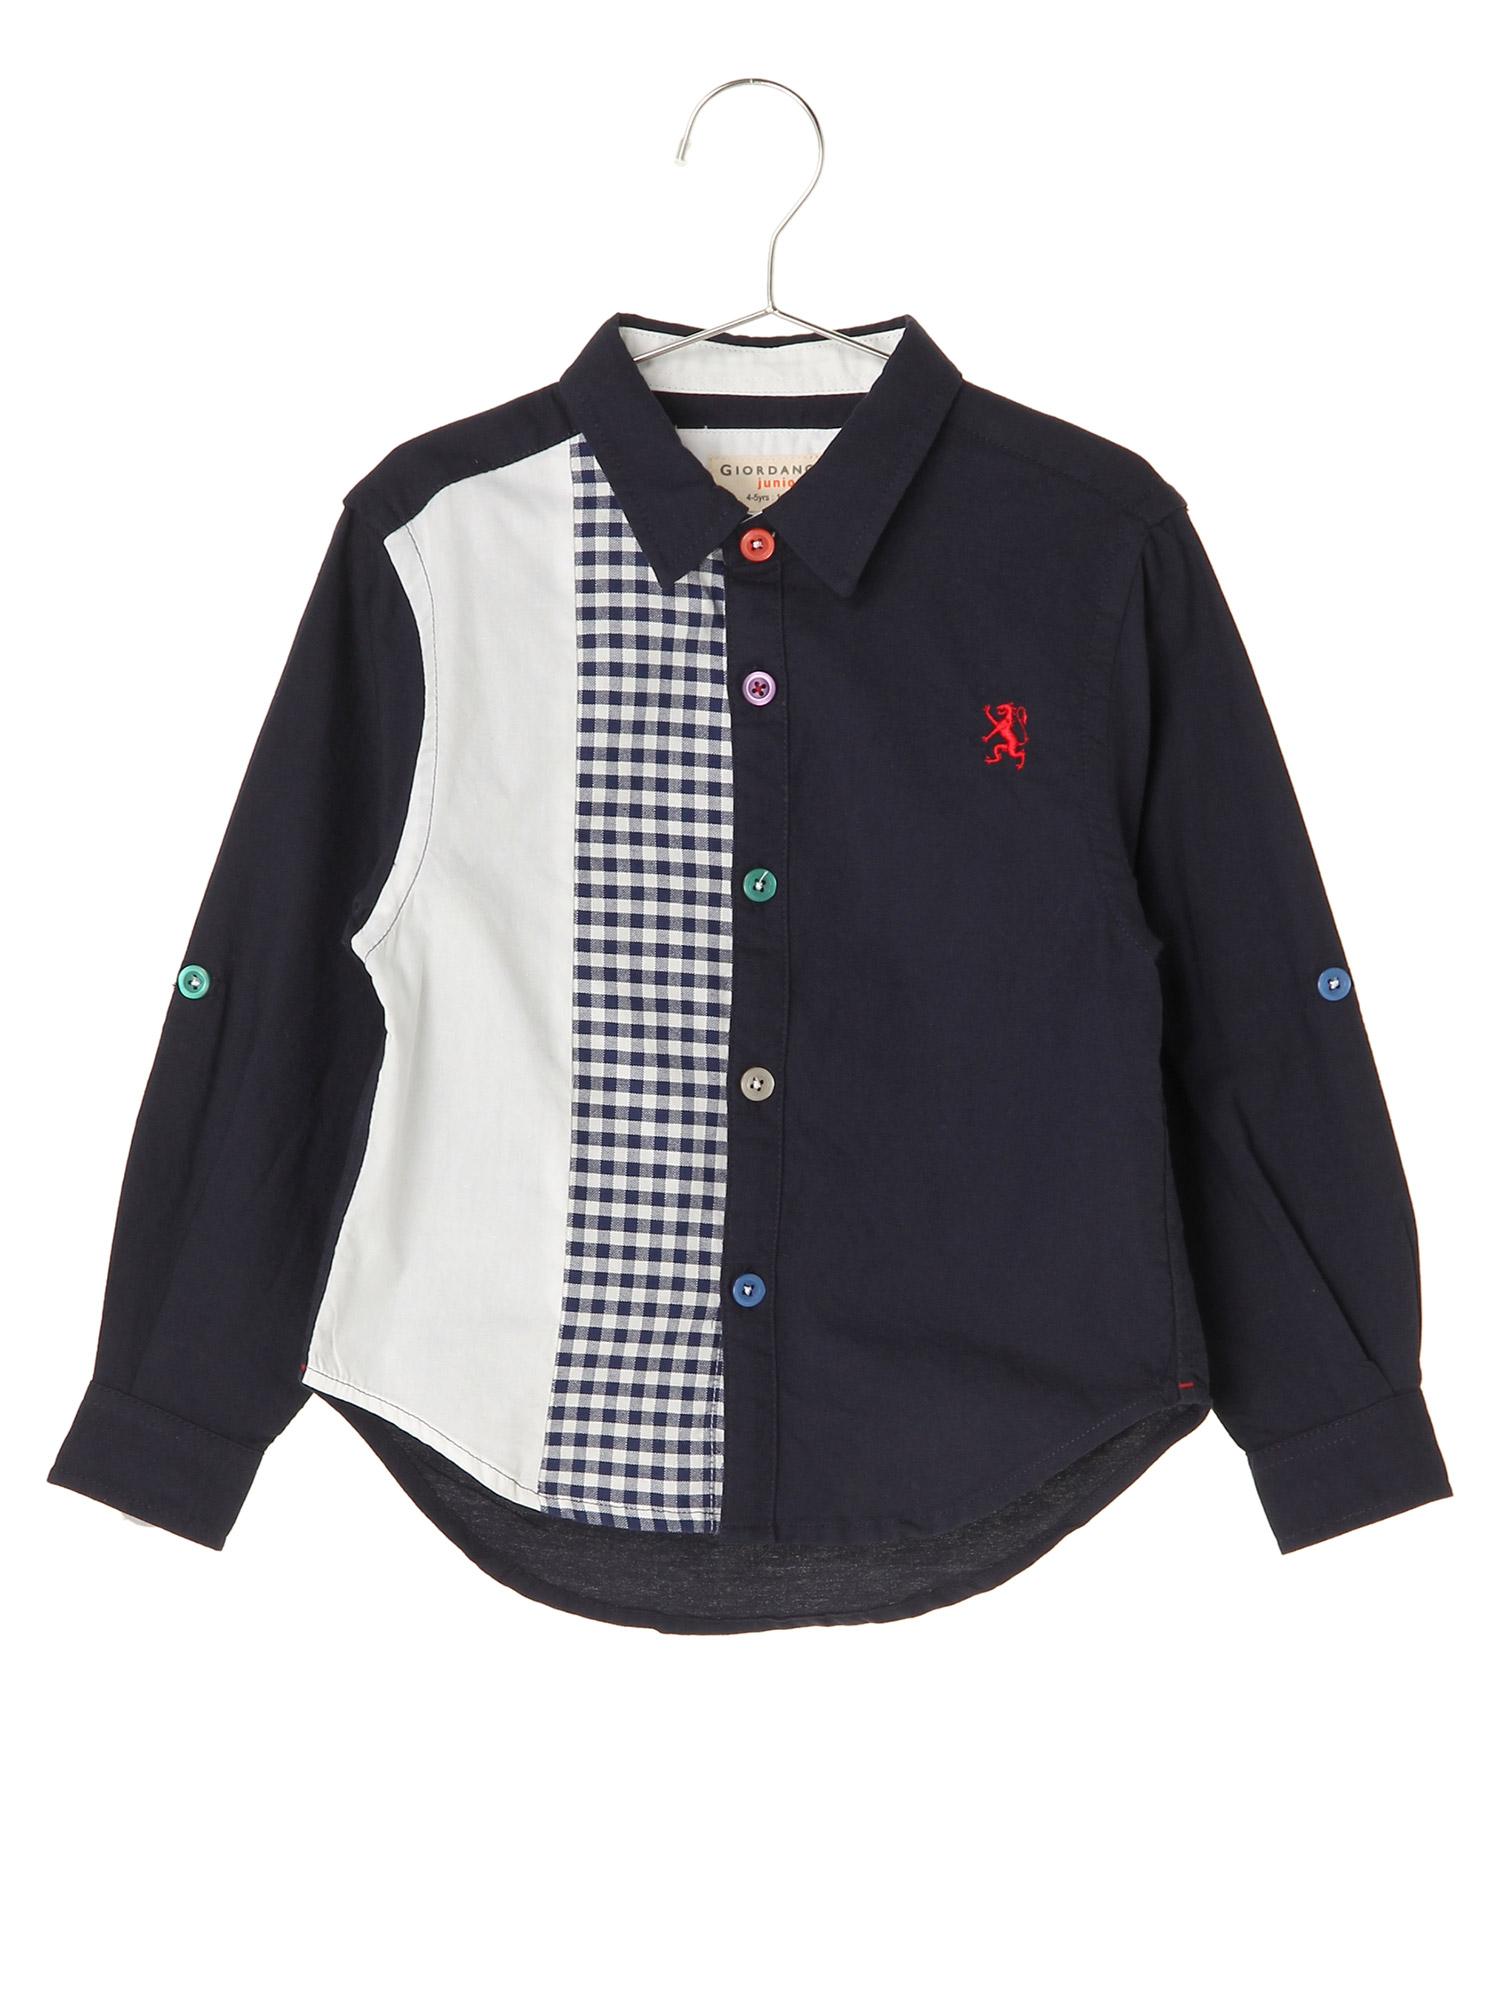 [GIORDANO]ライオン刺繍ブロッキングデザインオックスフォードシャツ